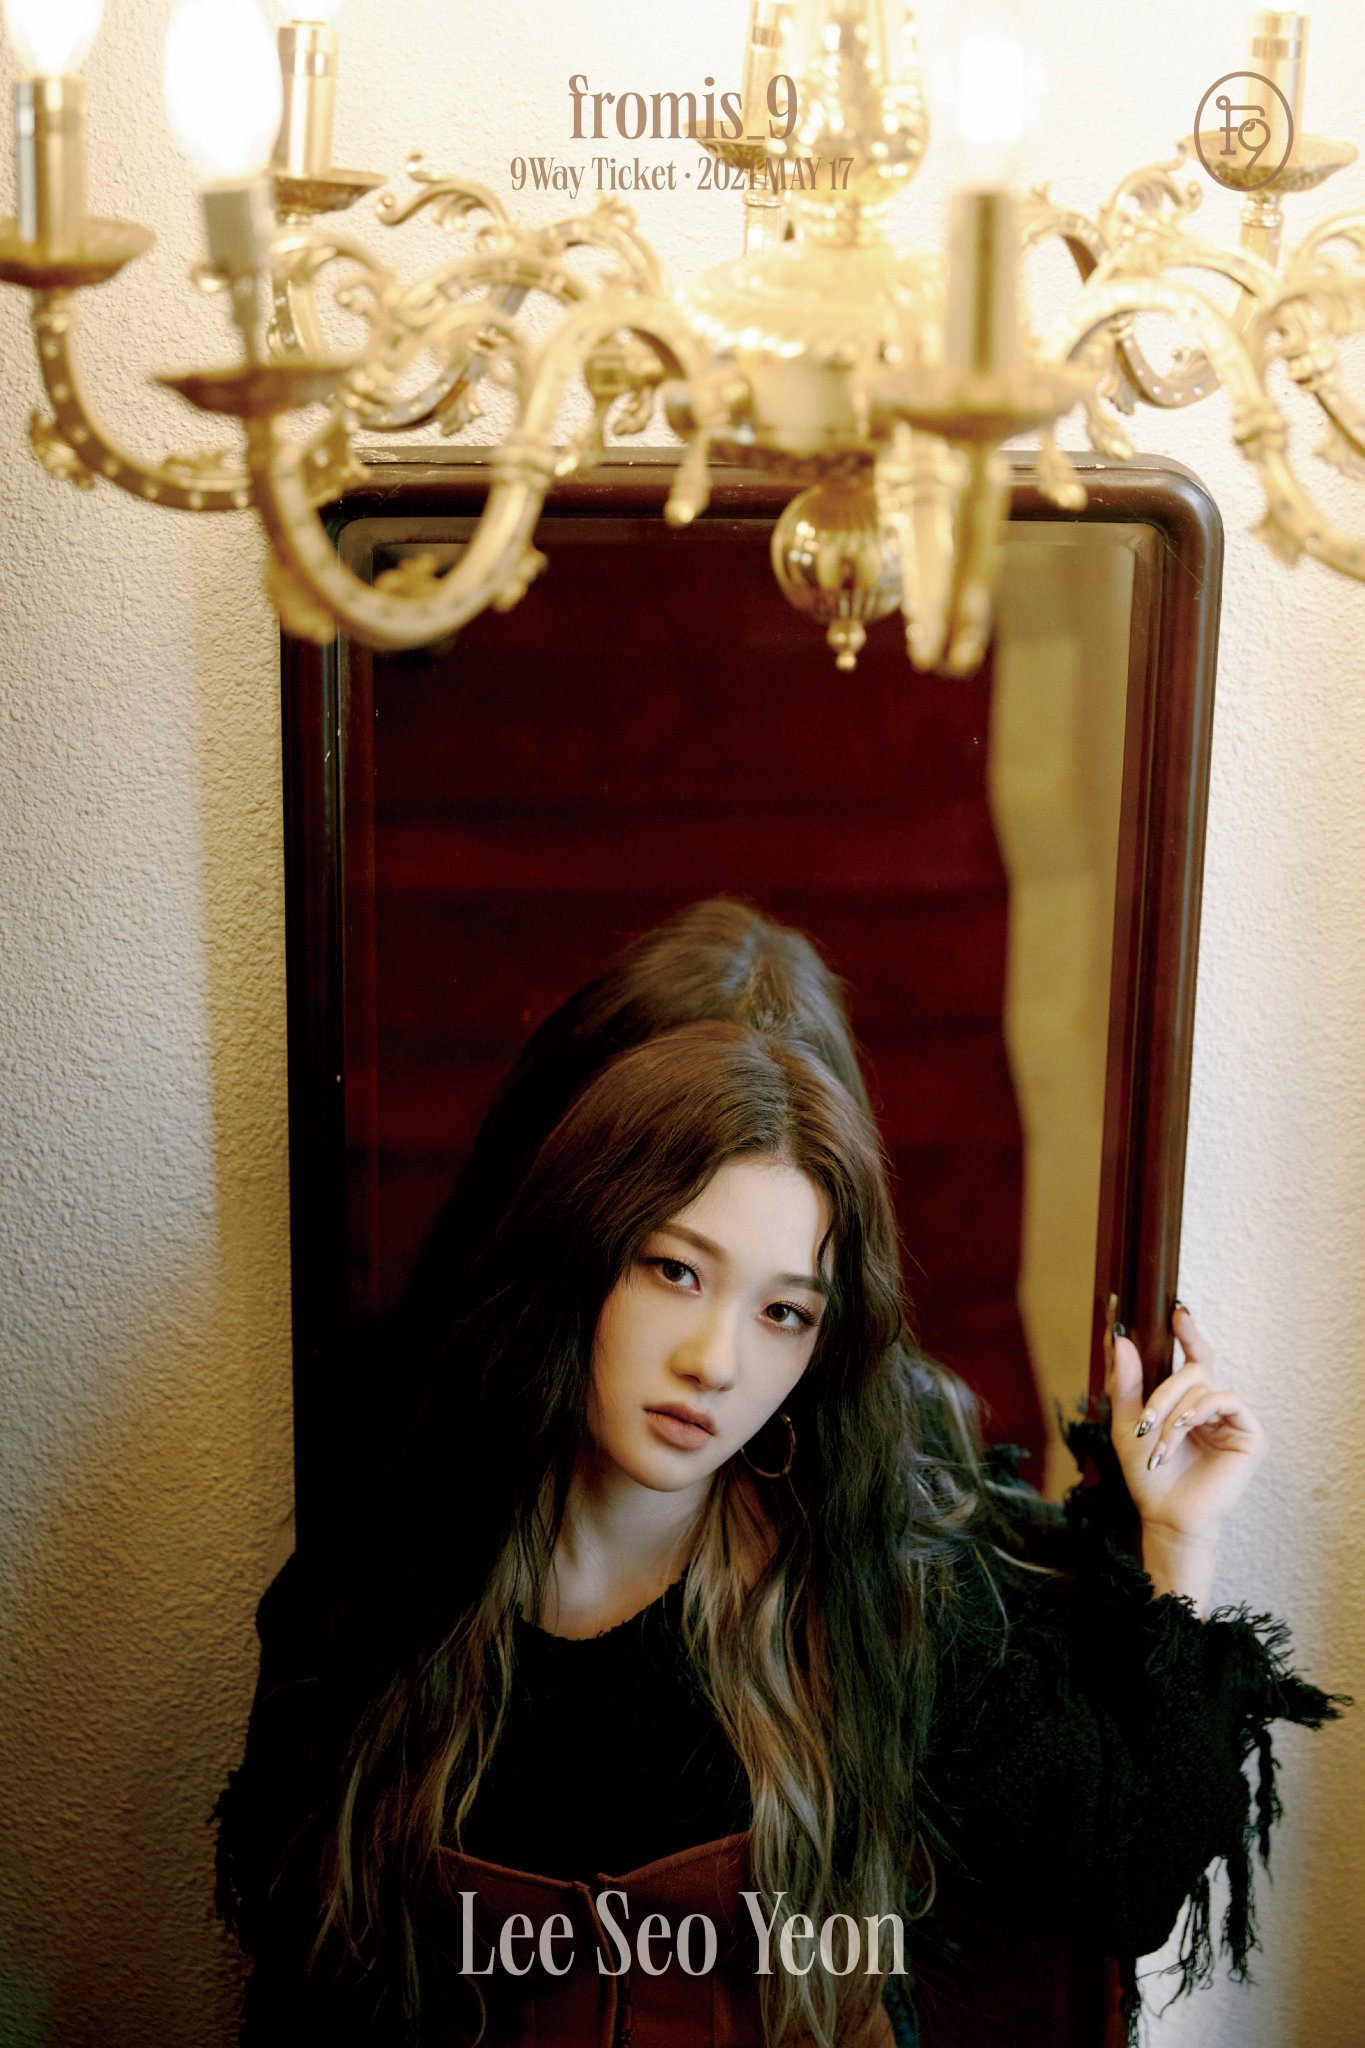 Lee Seo Yeon 2